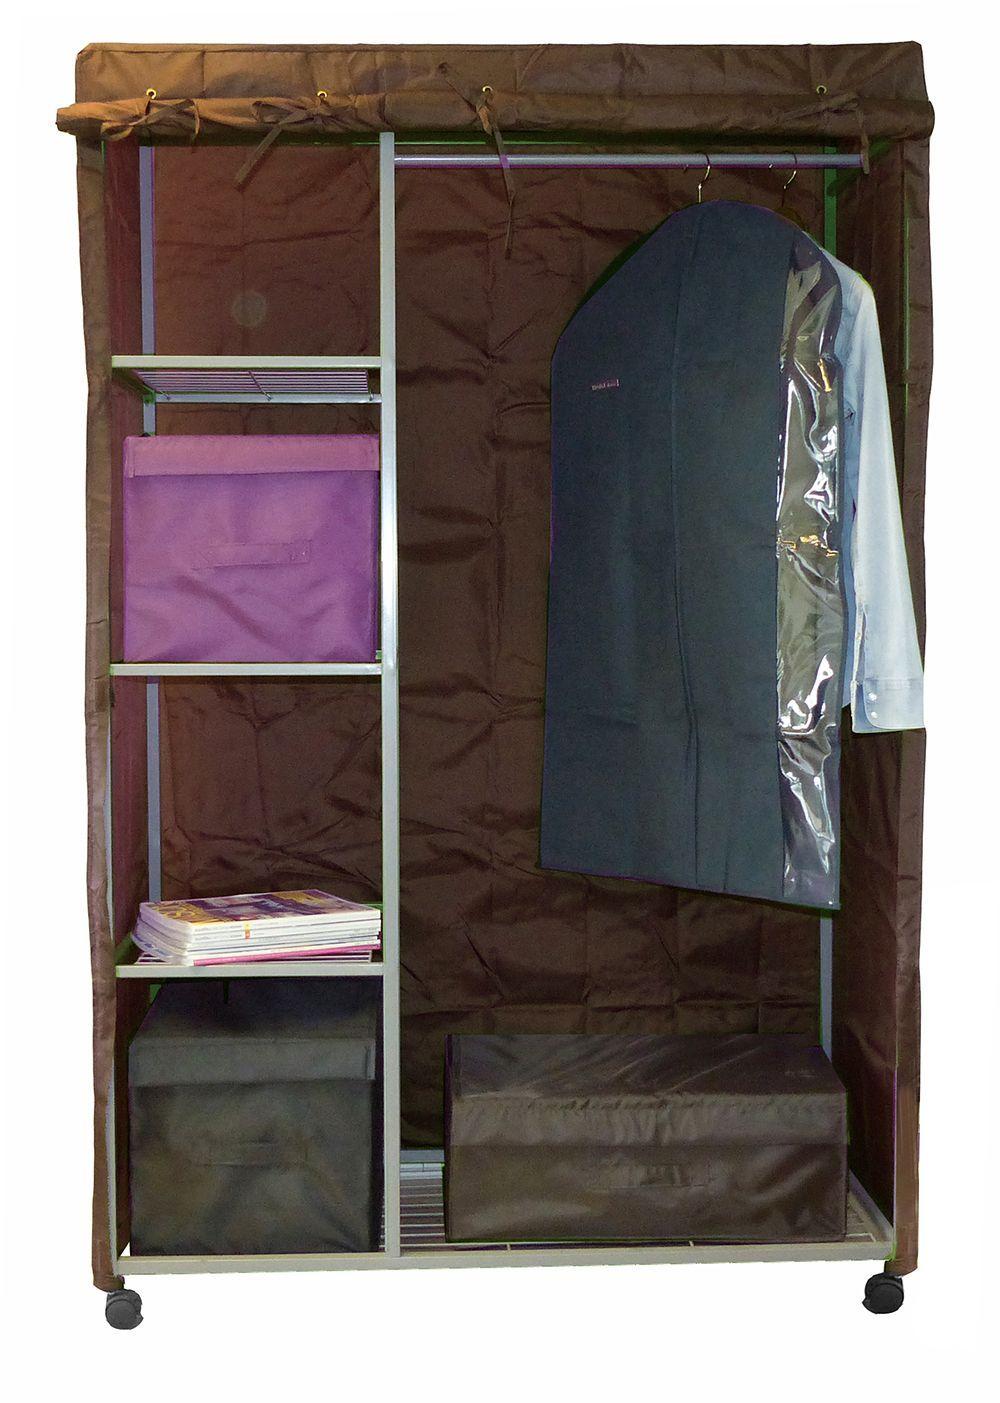 penderie en m tal avec housse will b ebay. Black Bedroom Furniture Sets. Home Design Ideas